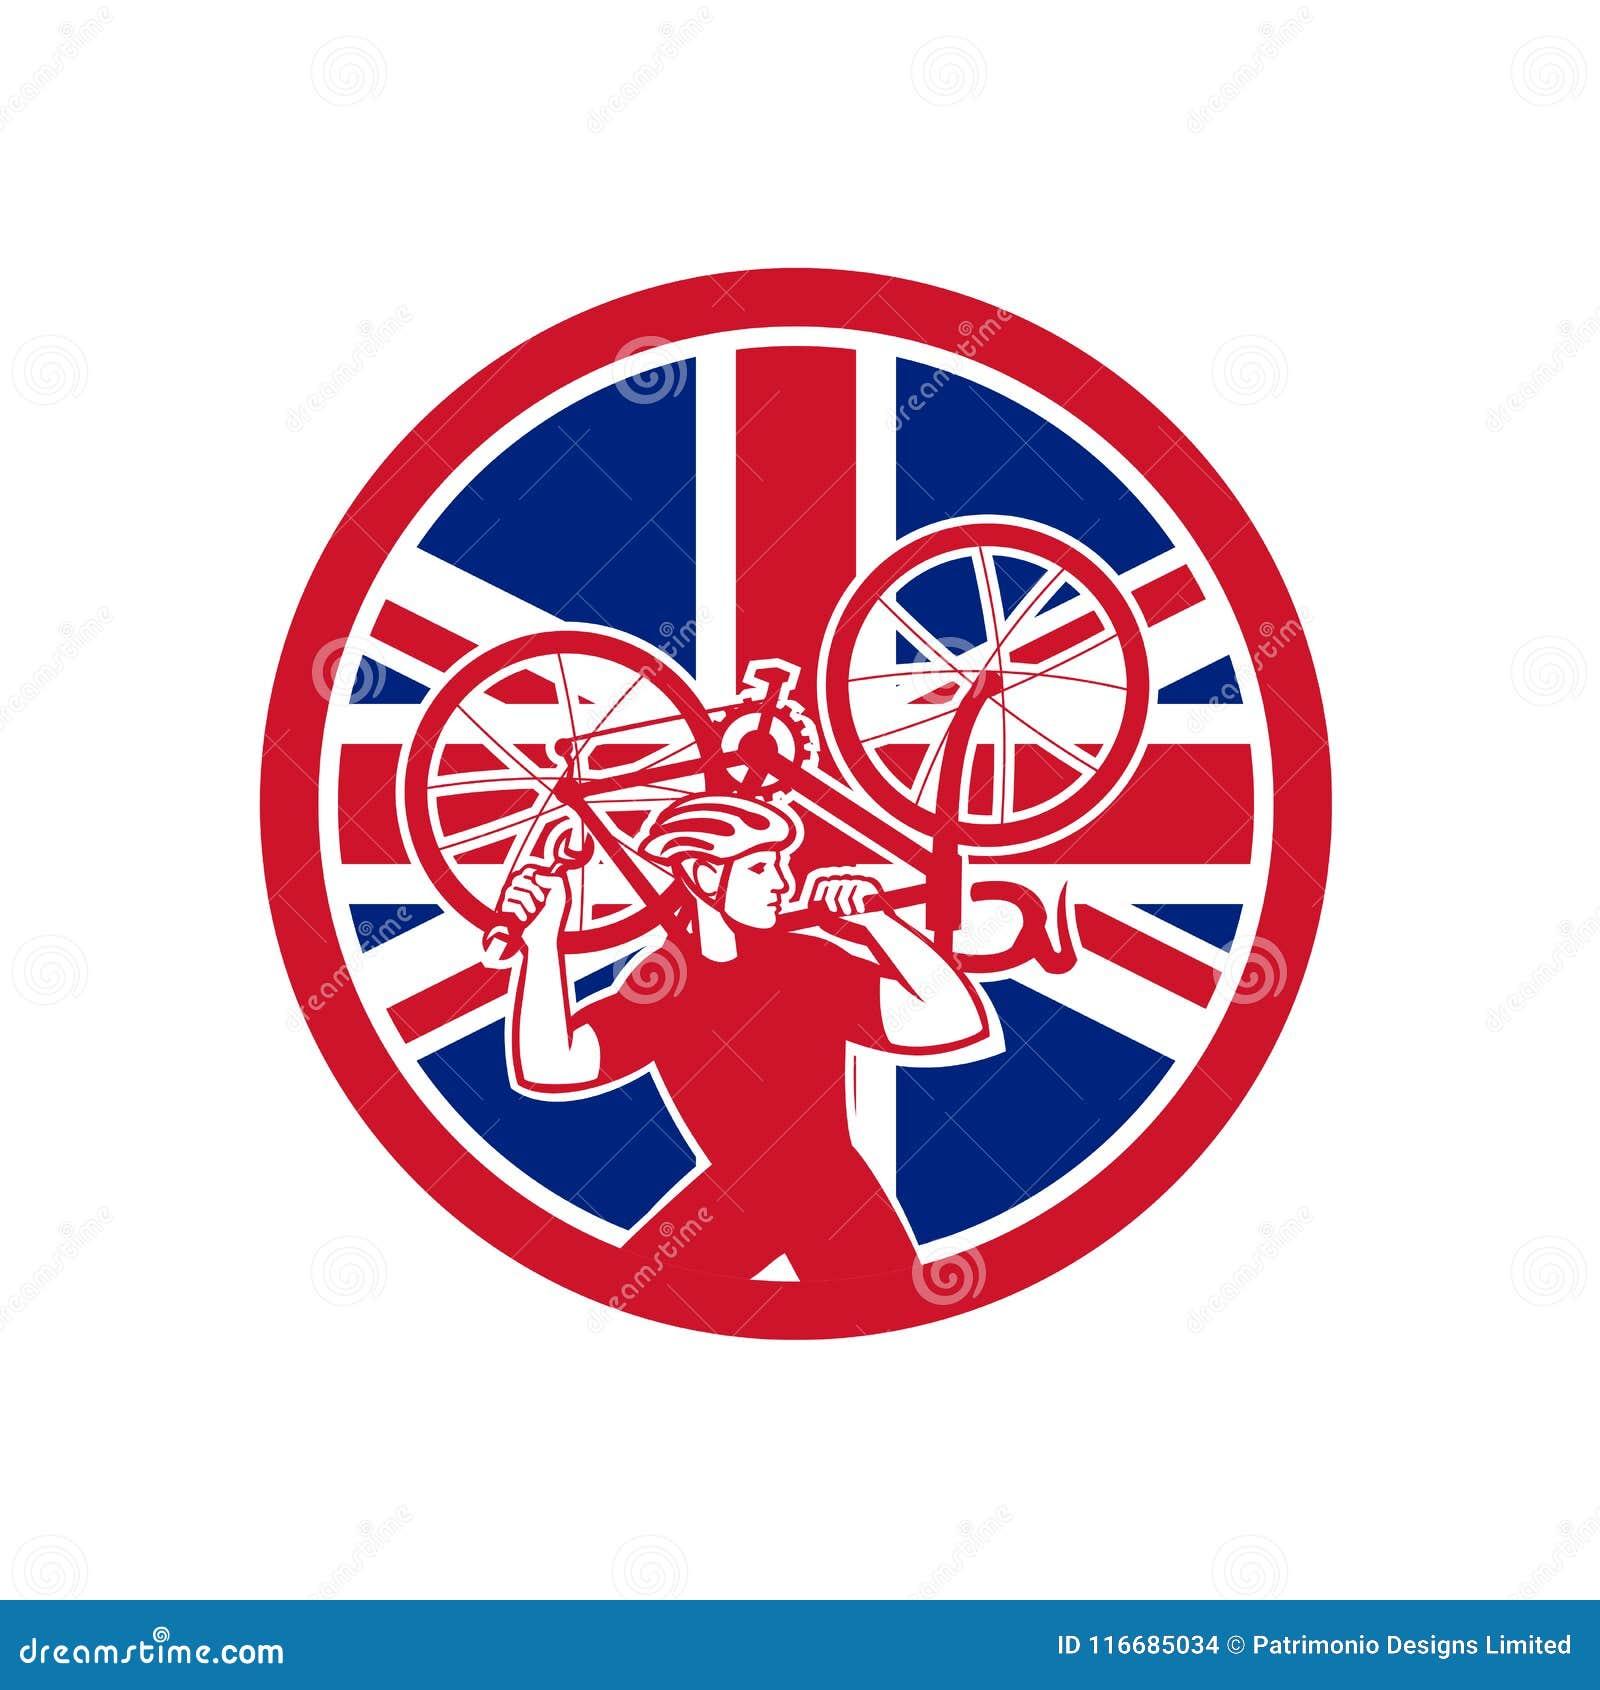 Britischer Fahrrad-Mechaniker Union Jack Flag Mascot